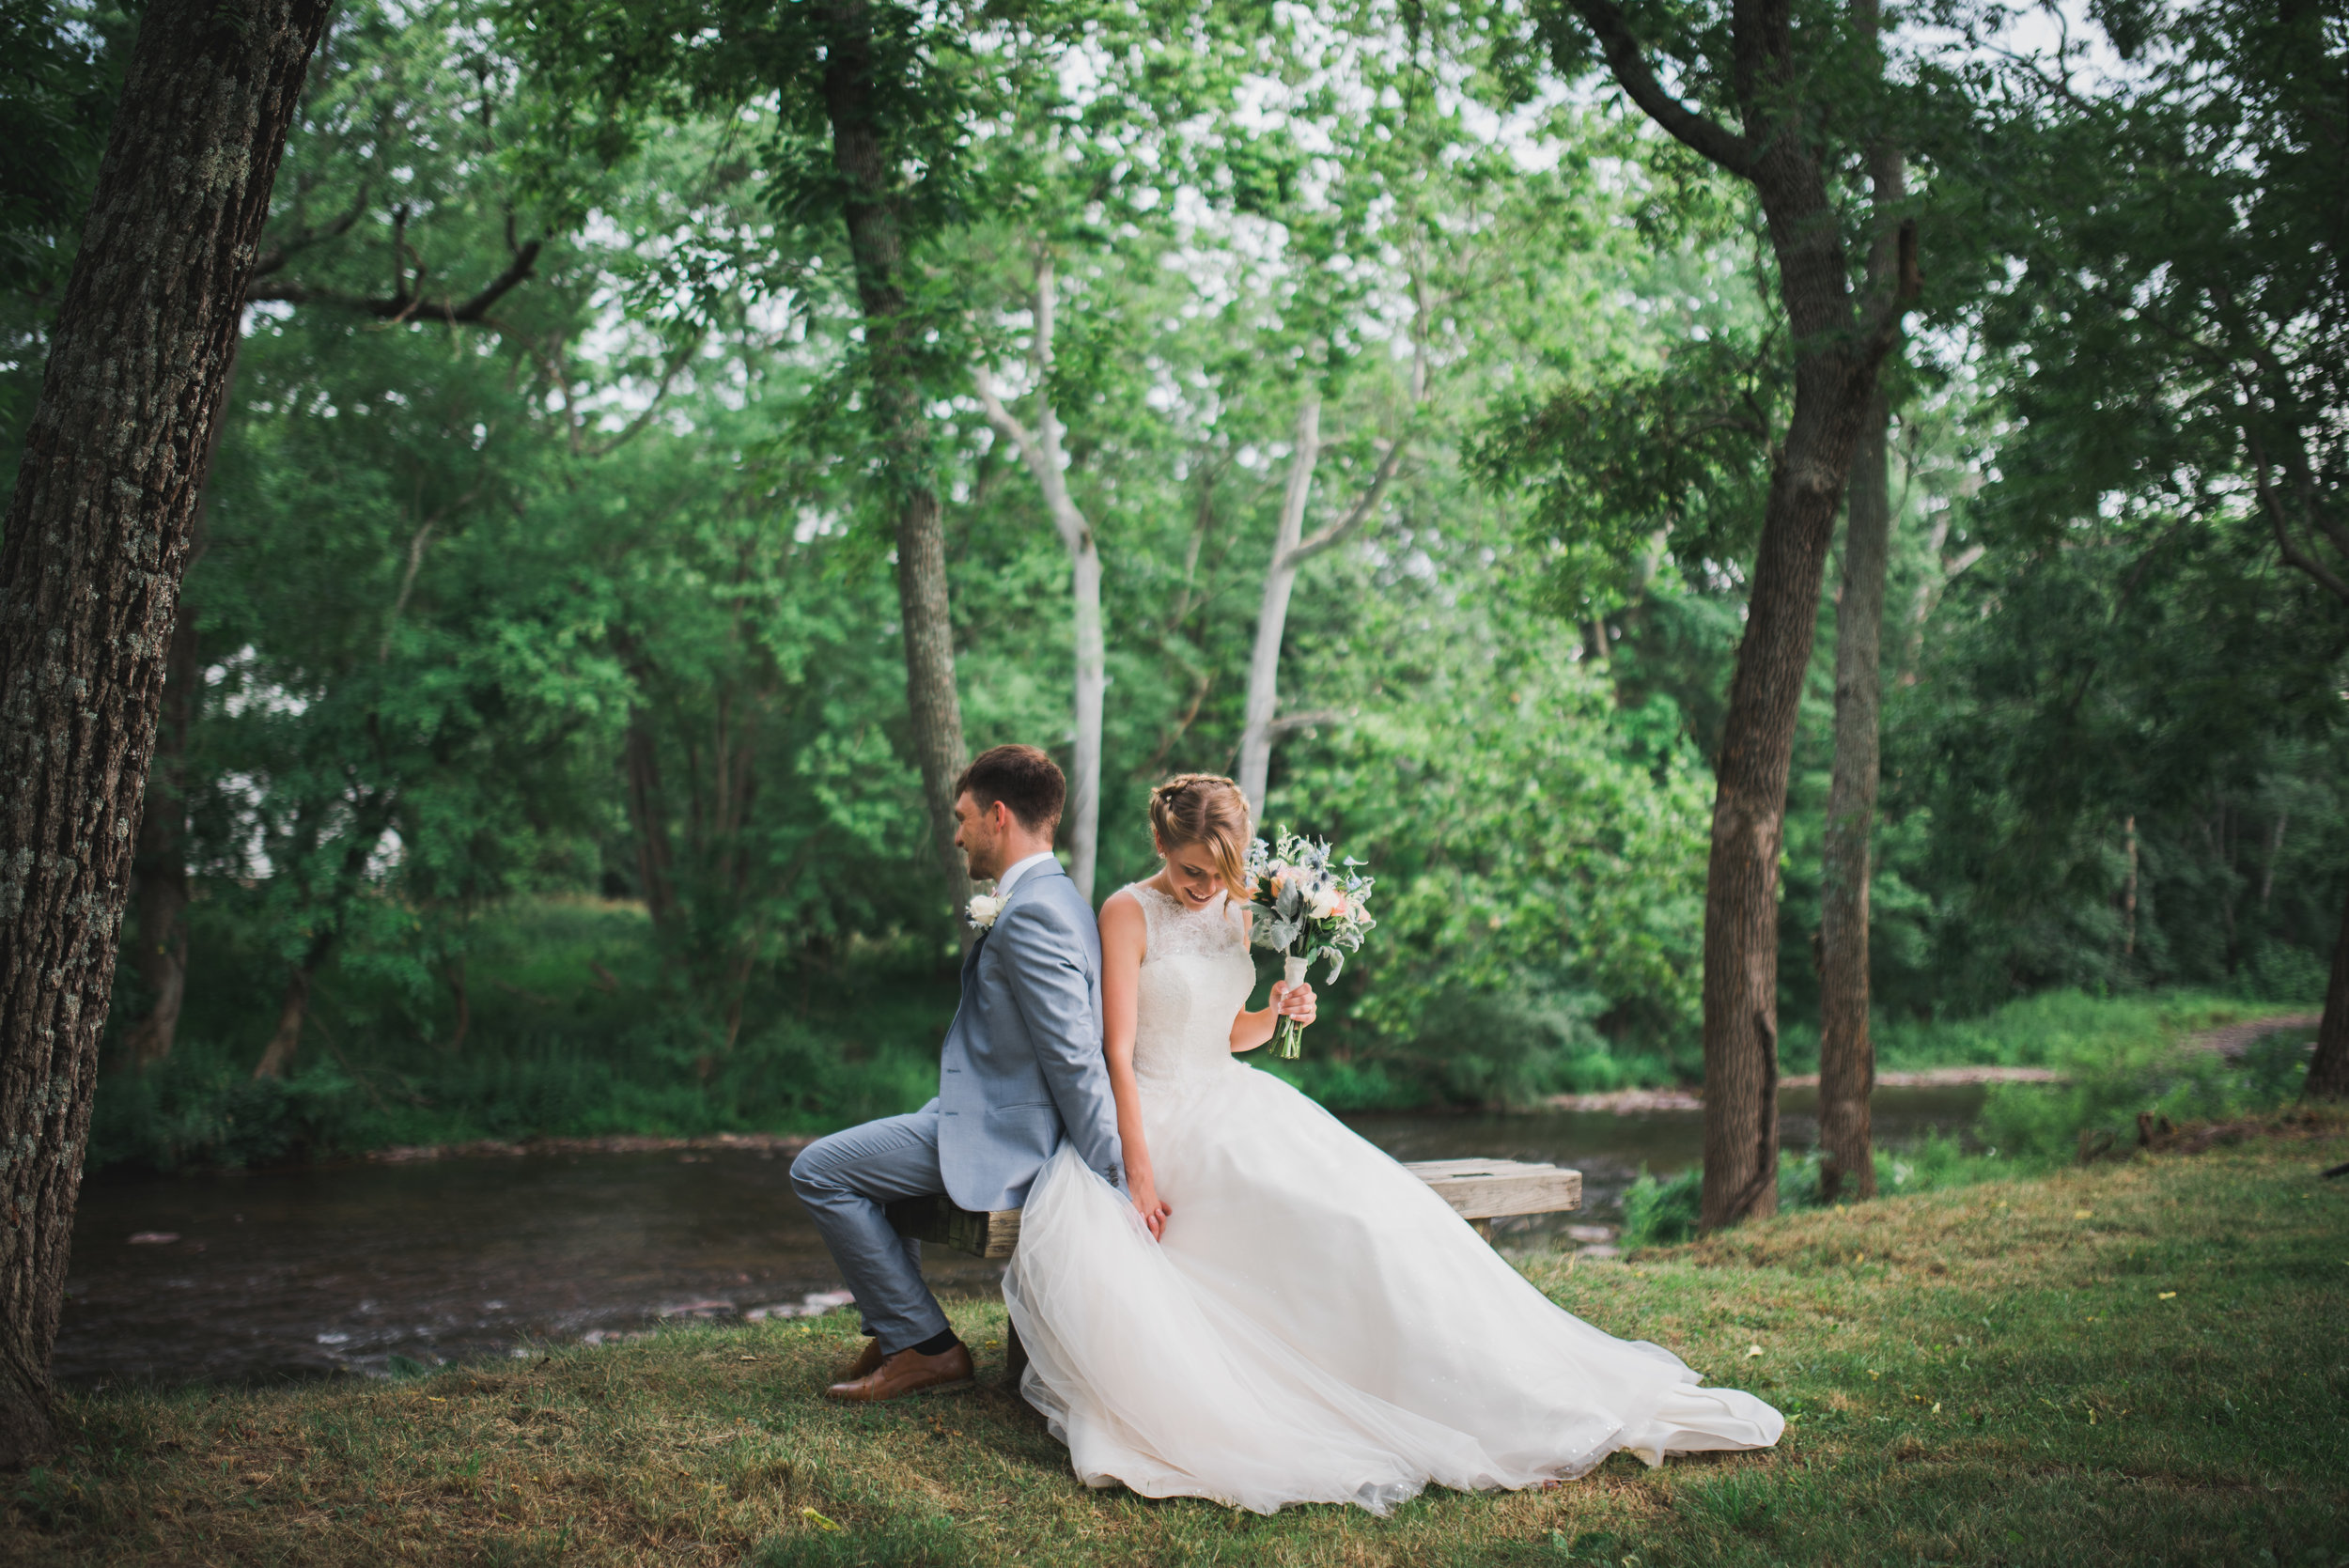 Nashville-Wedding-Photographer-Favorites148.jpg